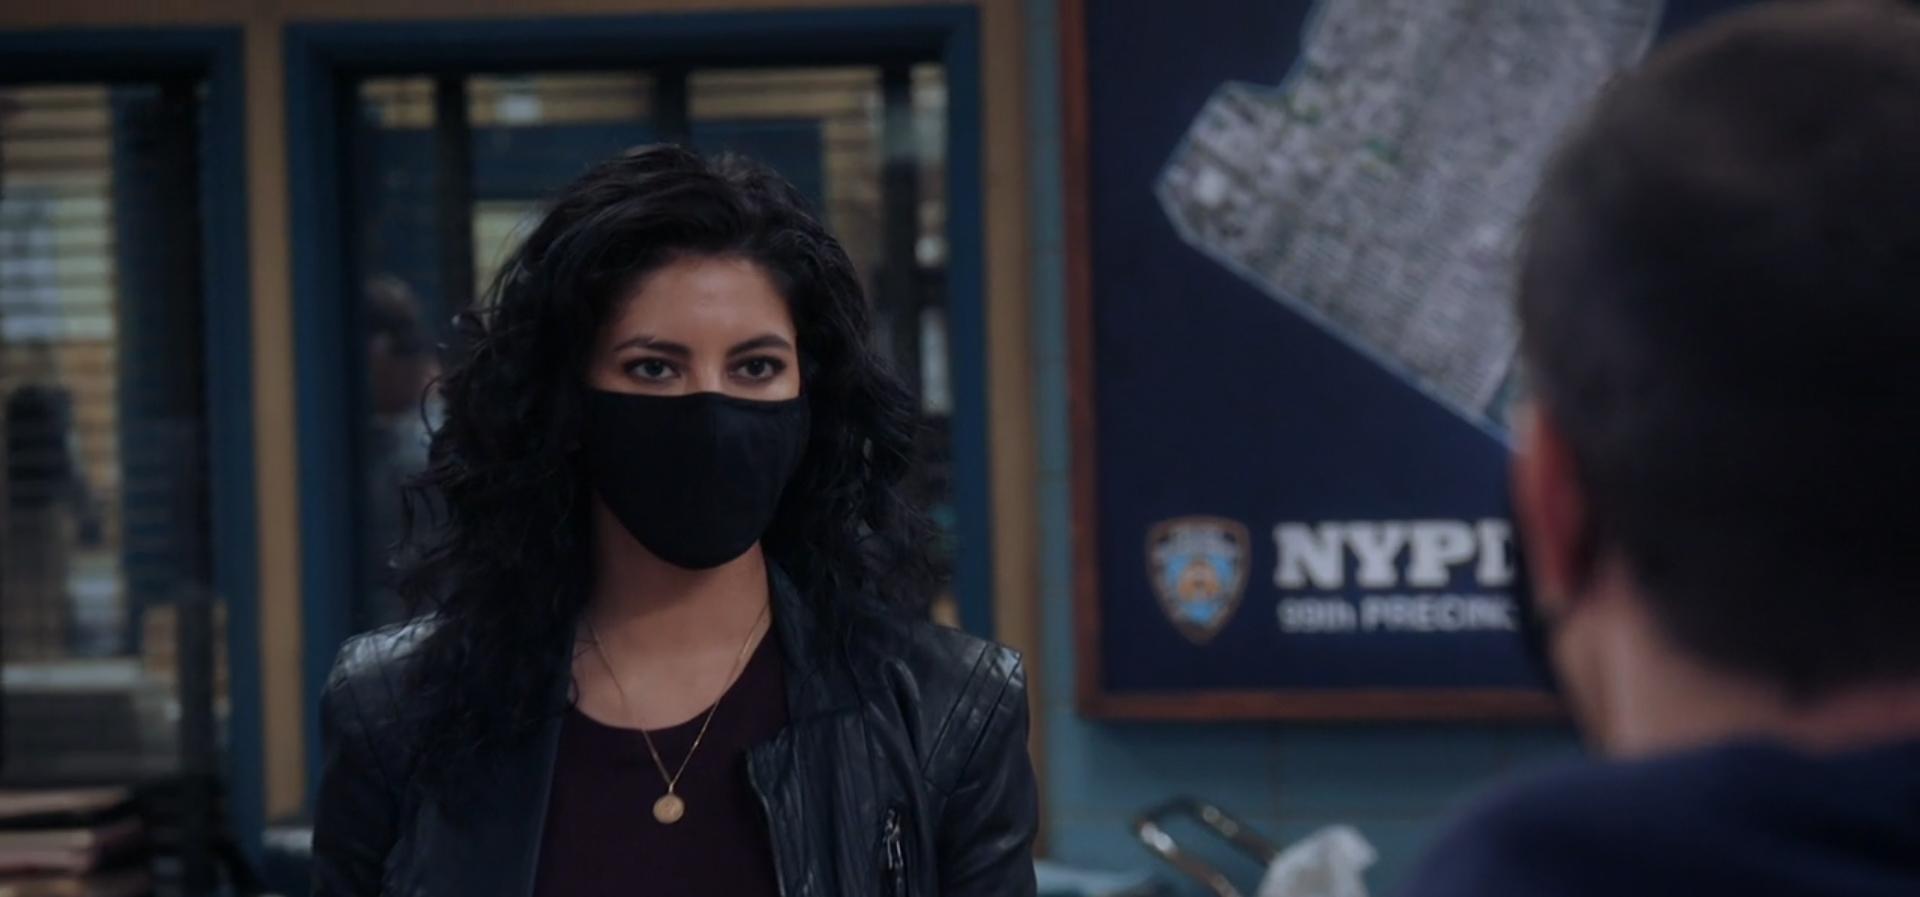 Brooklyn Nine-Nine: The Good Ones. Image Credit: NBC Studios.